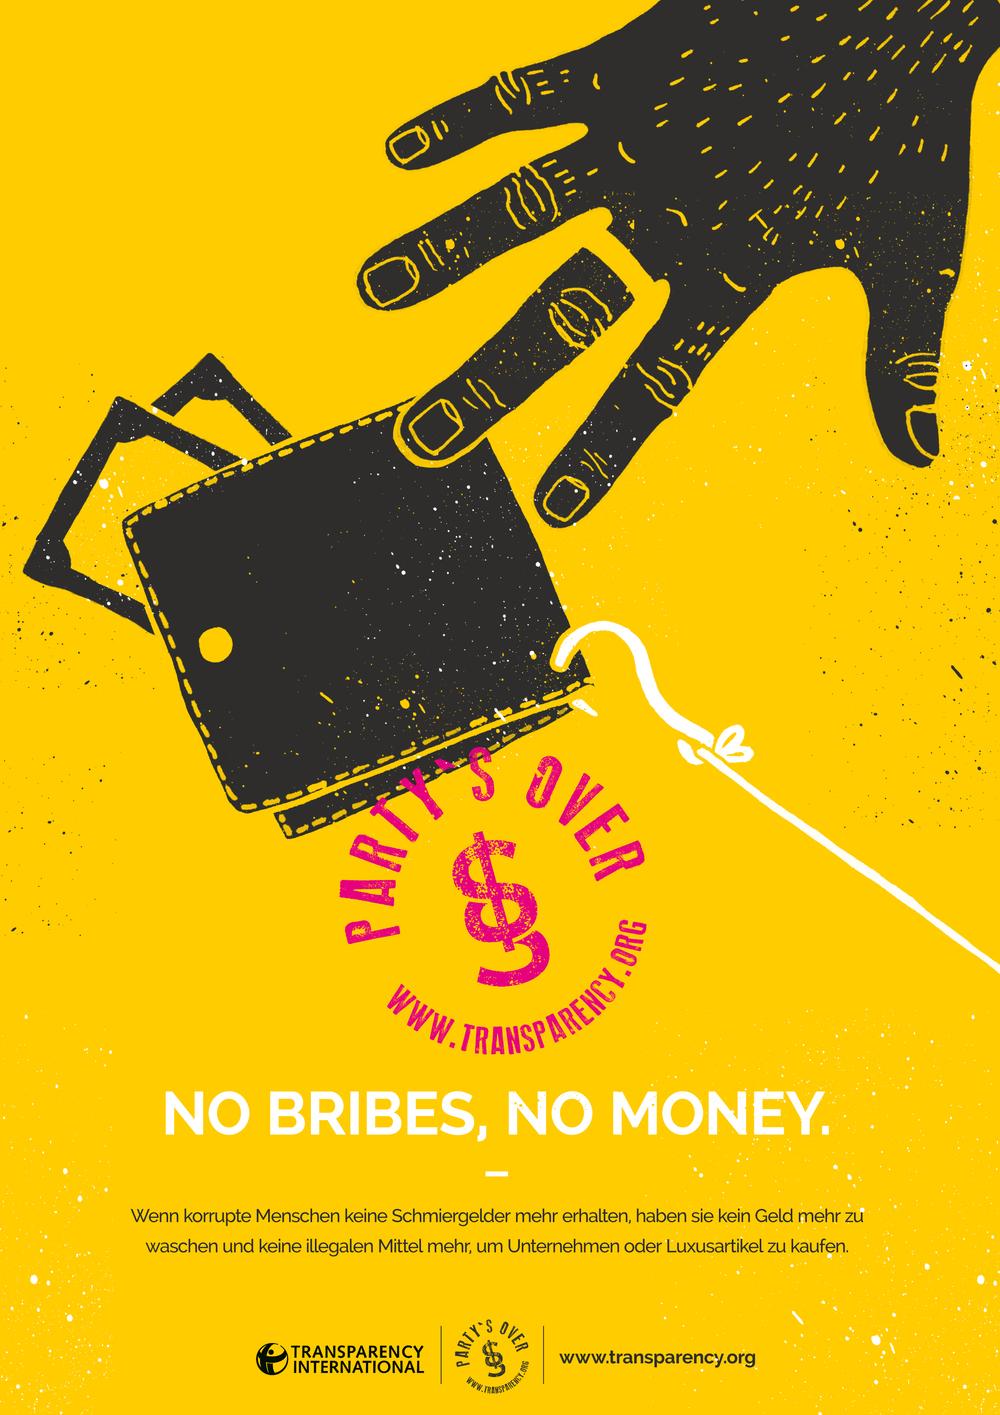 Neu transparency international poster002 bigger